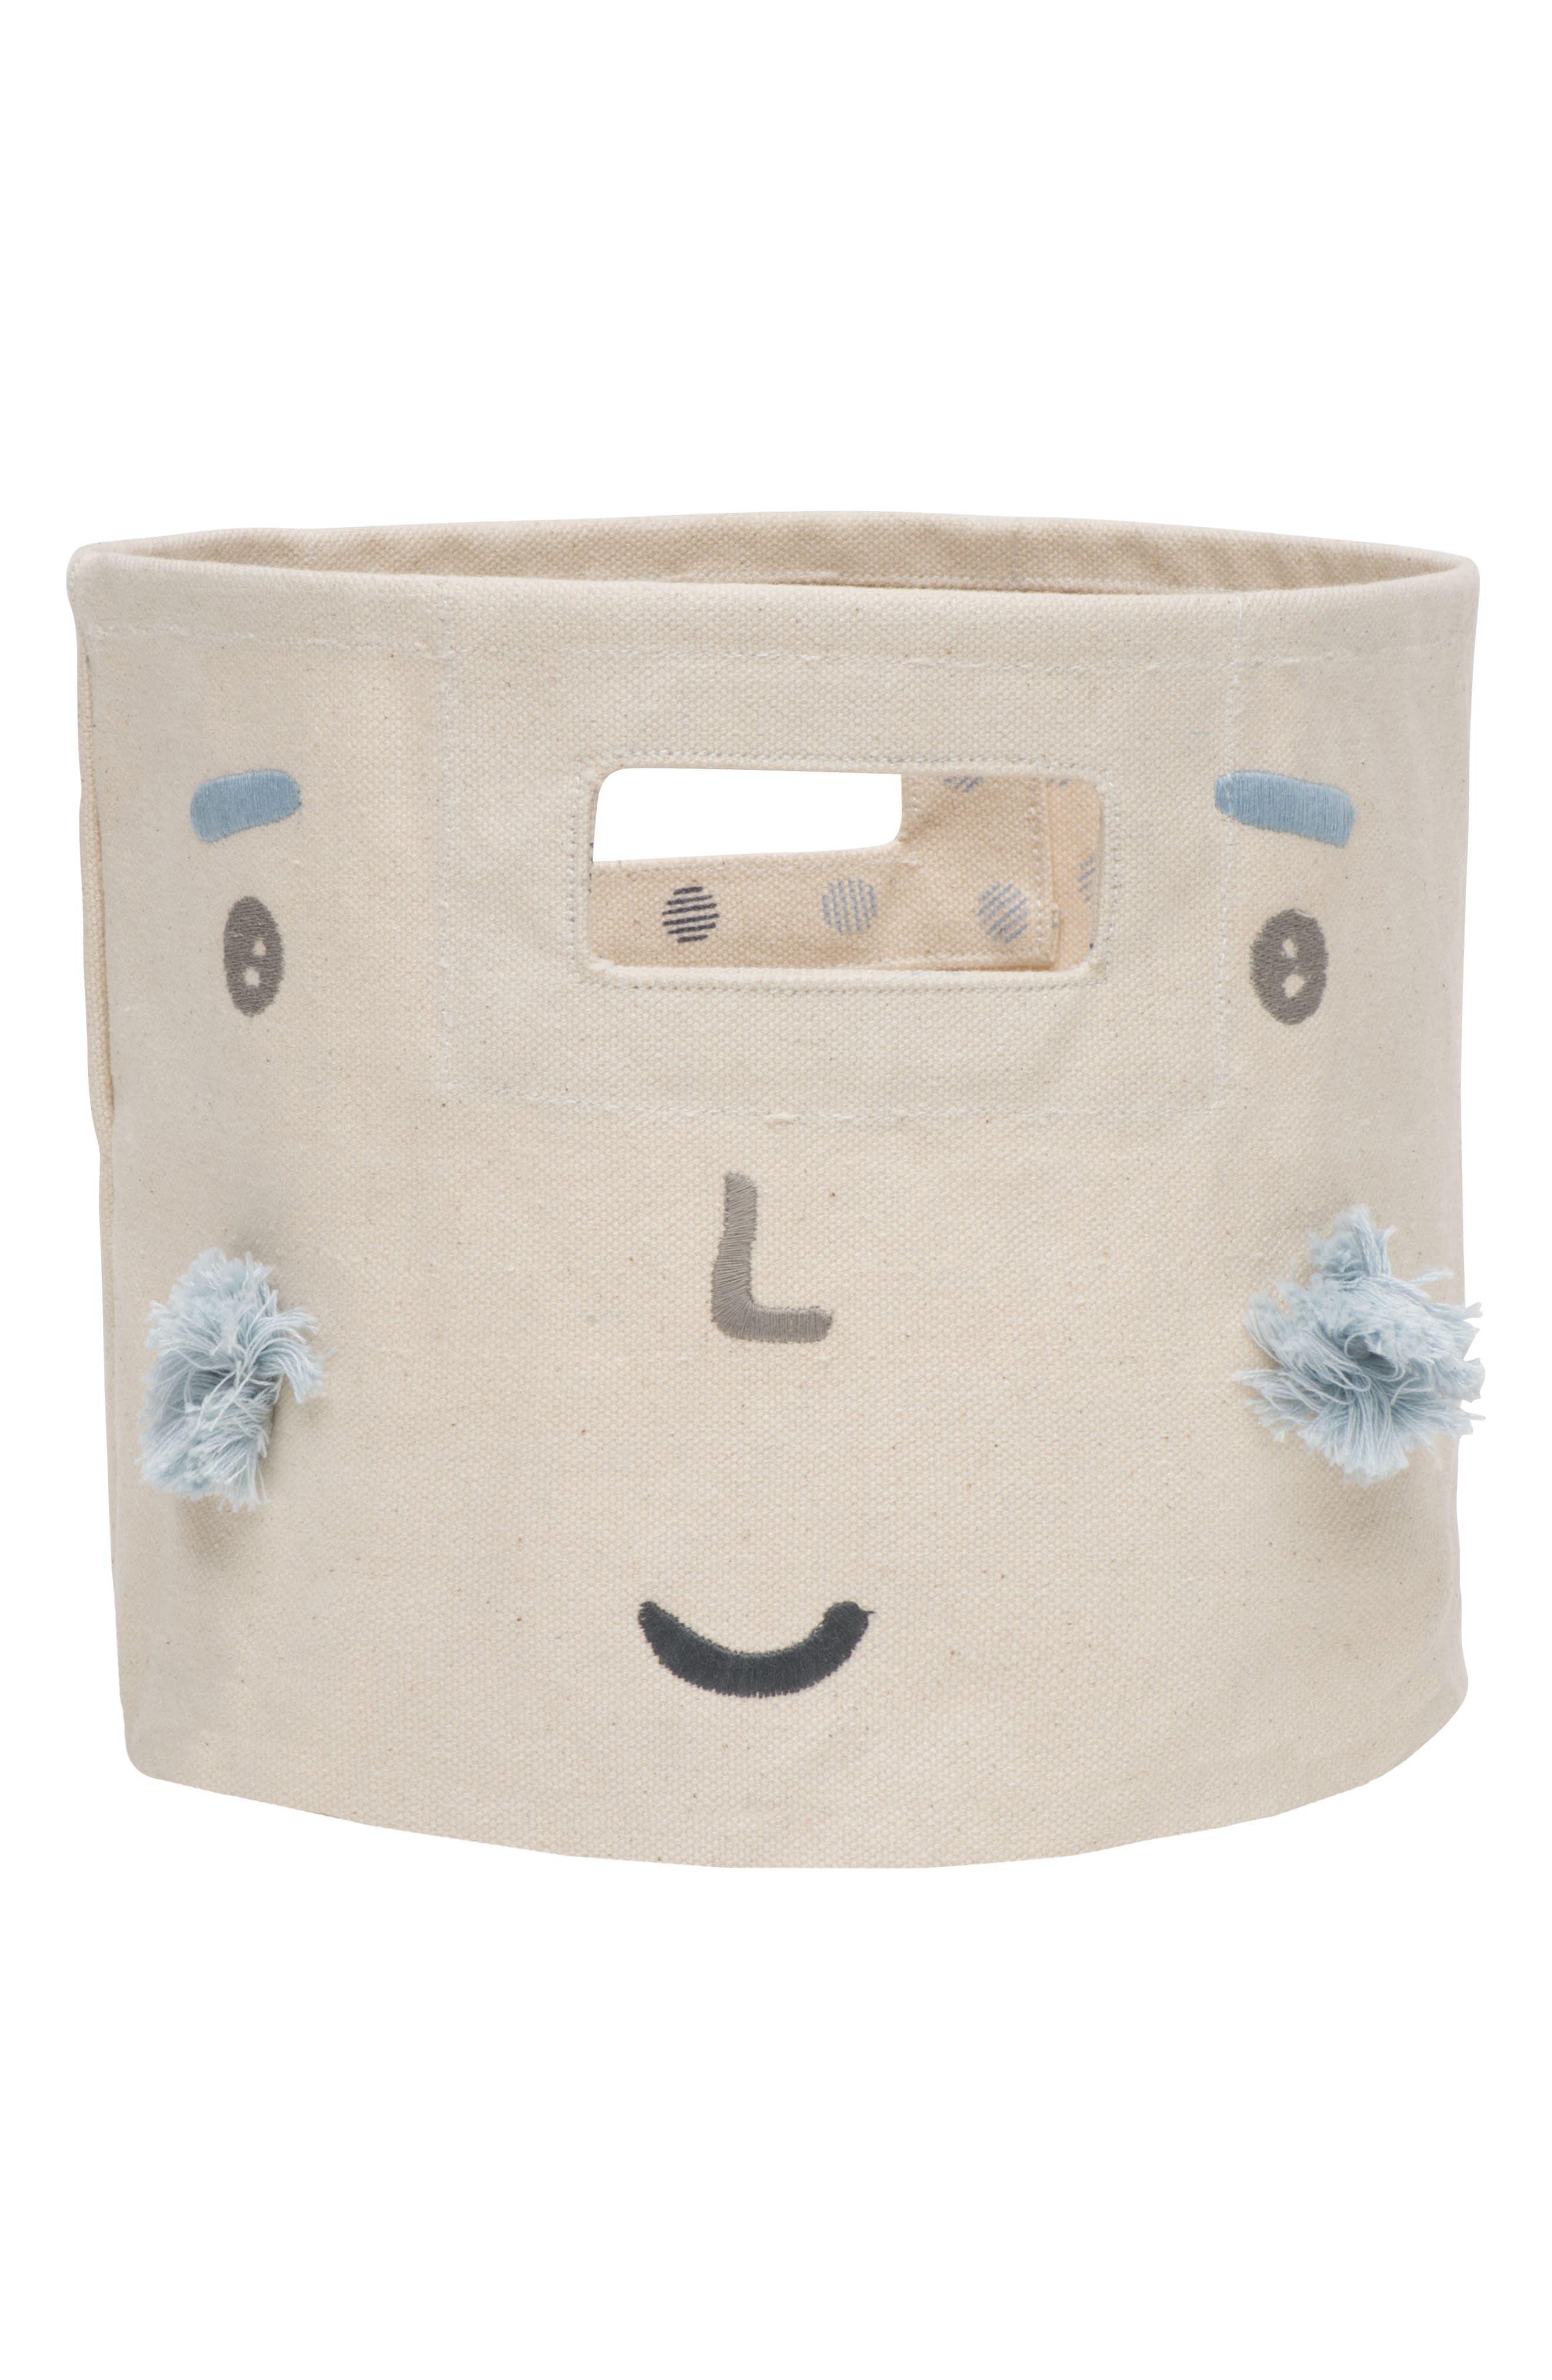 Peek-A-Boo Boy Mini Canvas Bin,                         Main,                         color, Ivory